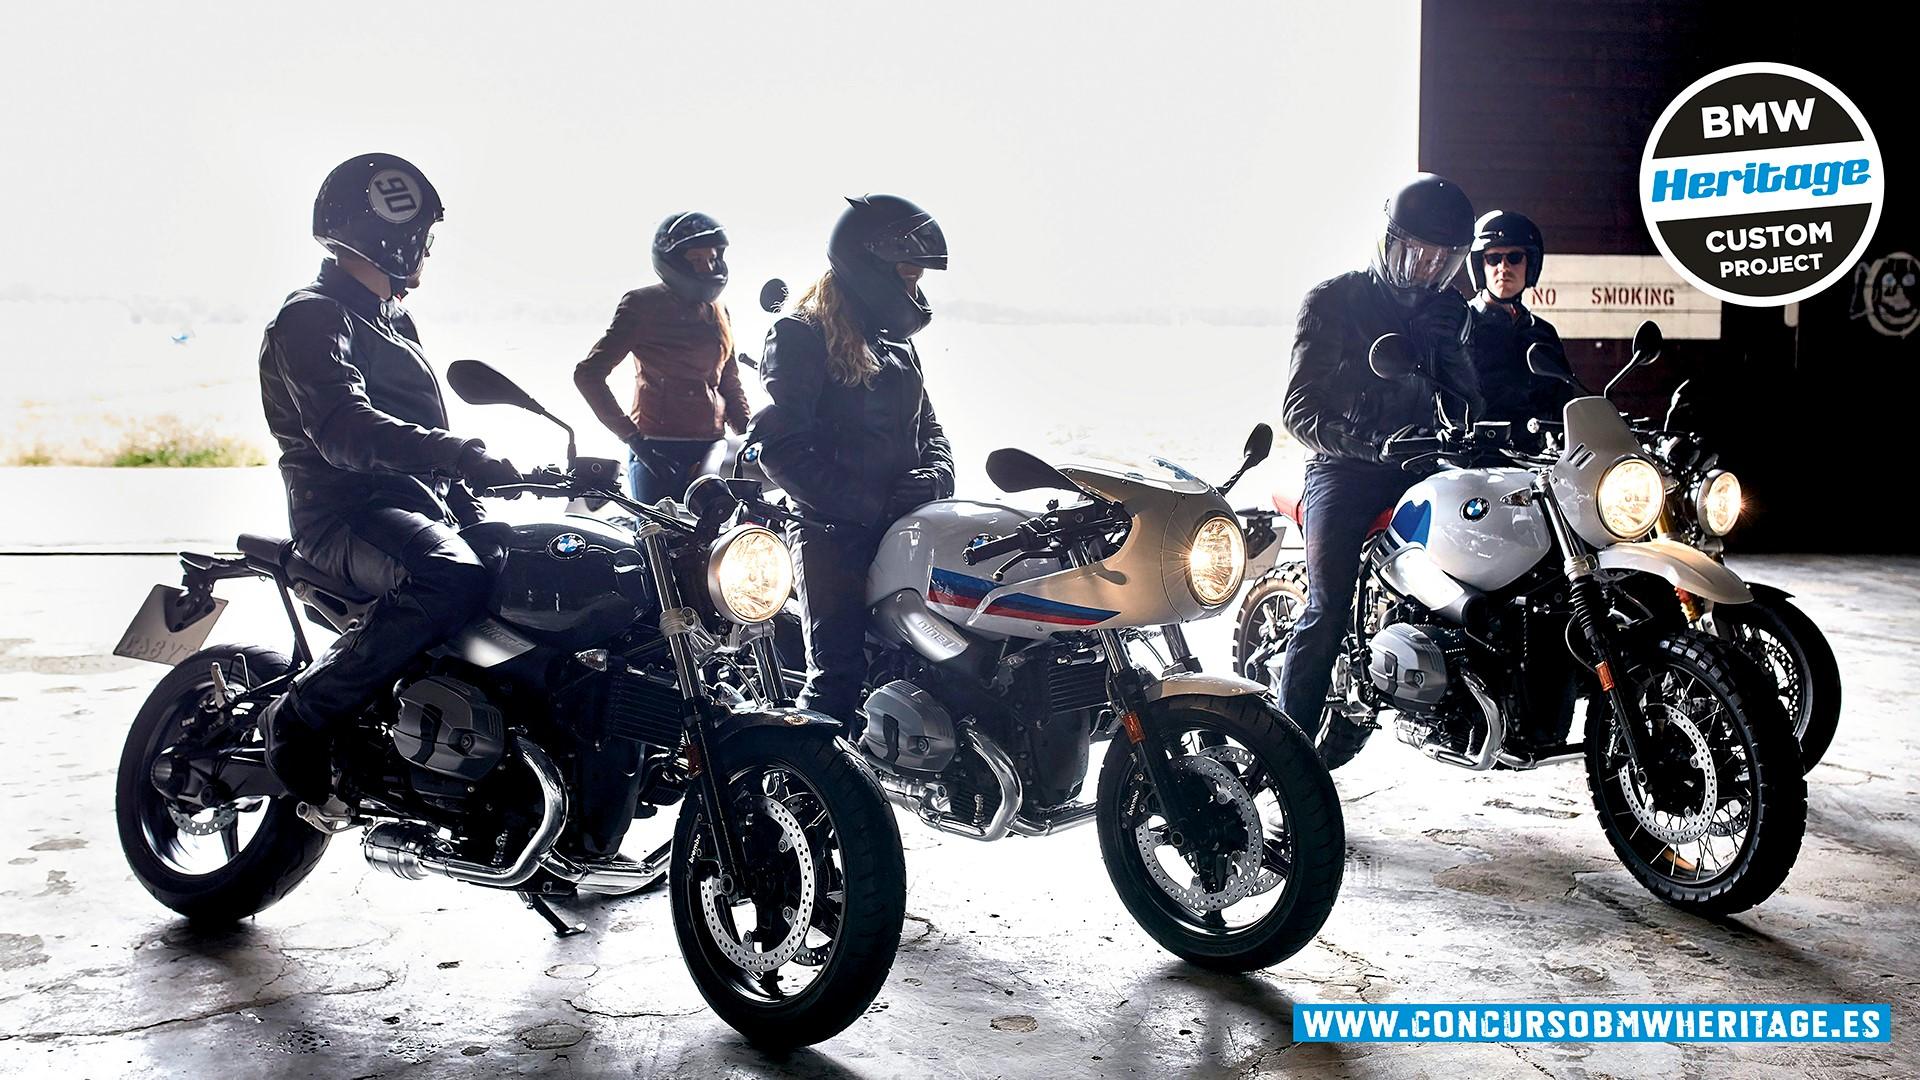 Vuelve el BMW Heritage Custom Project